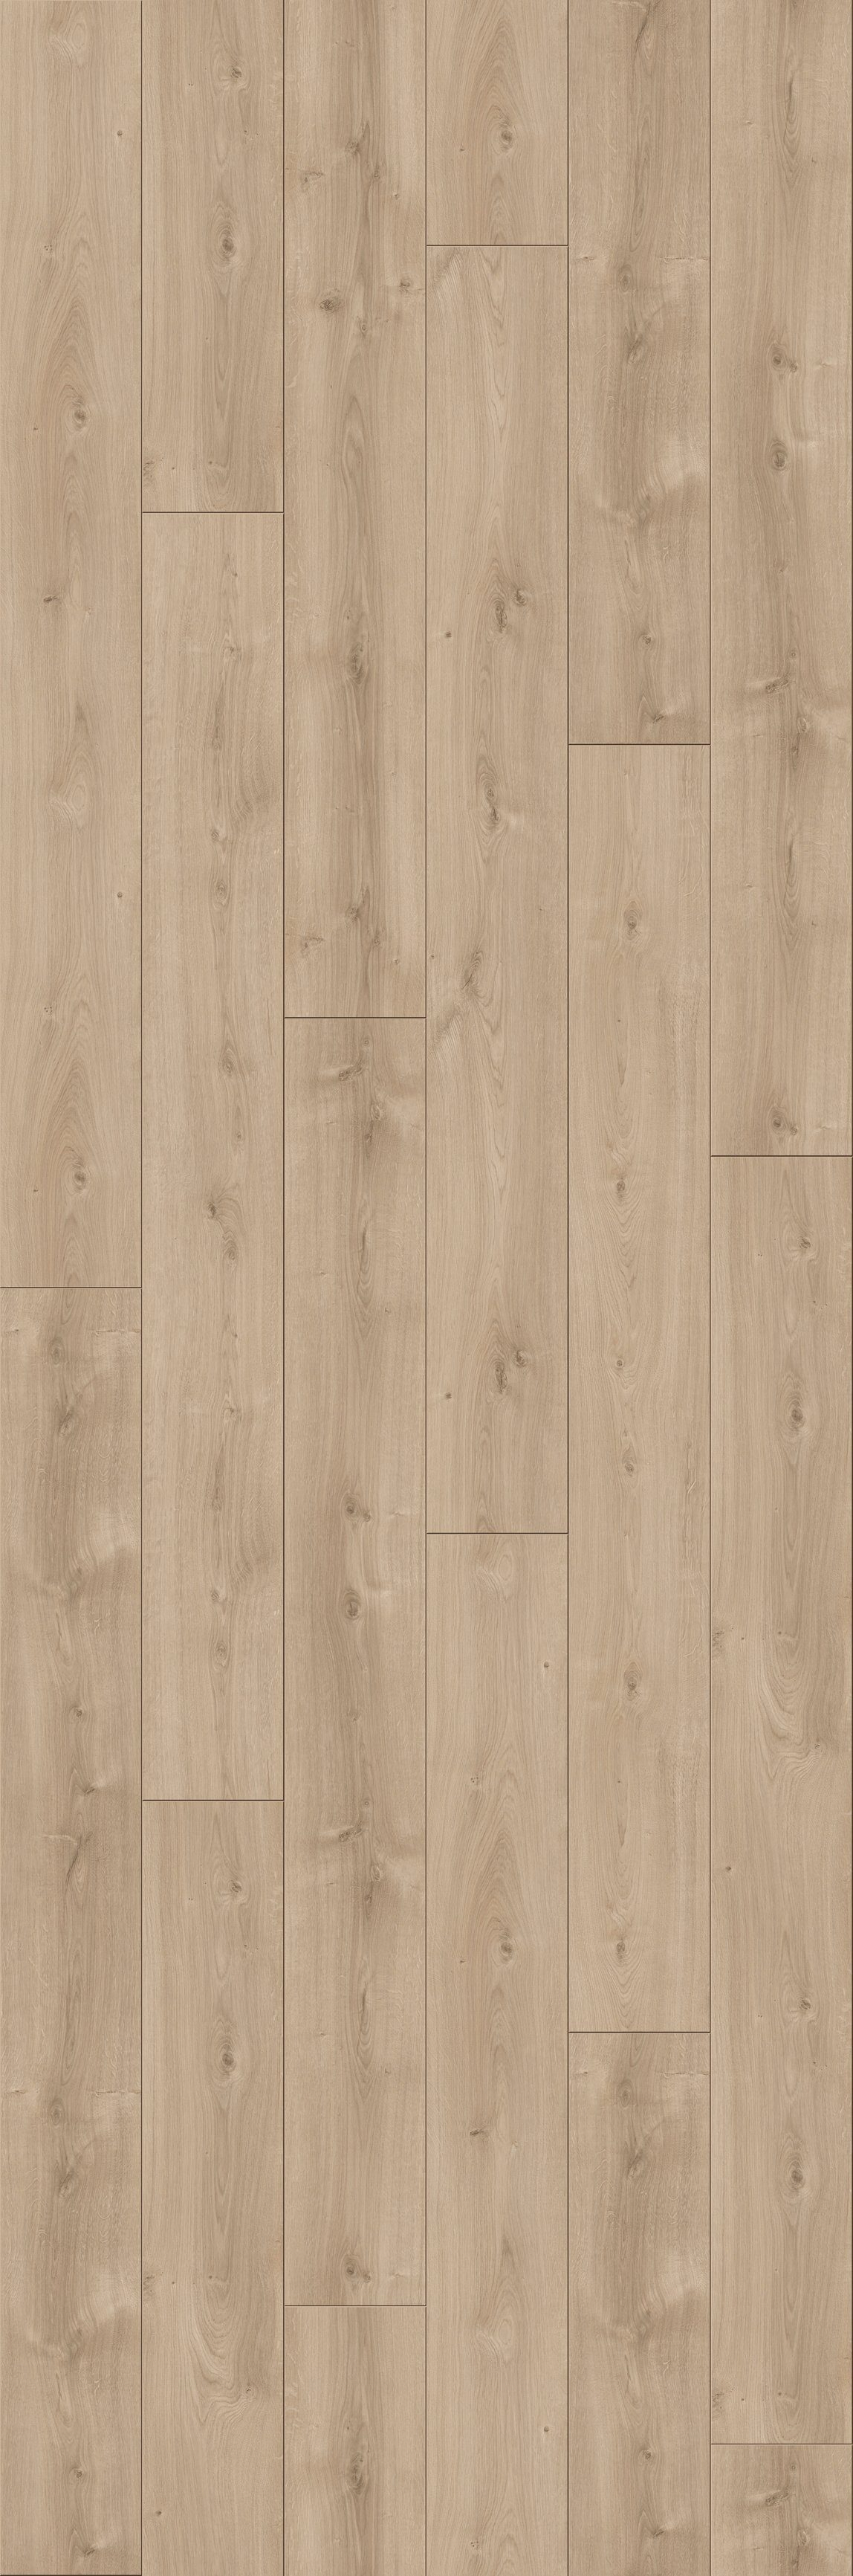 PARADOR Laminat »Trendtime 6 - Eiche Avant«, 2200 x 243 mm, Stärke: 9 mm